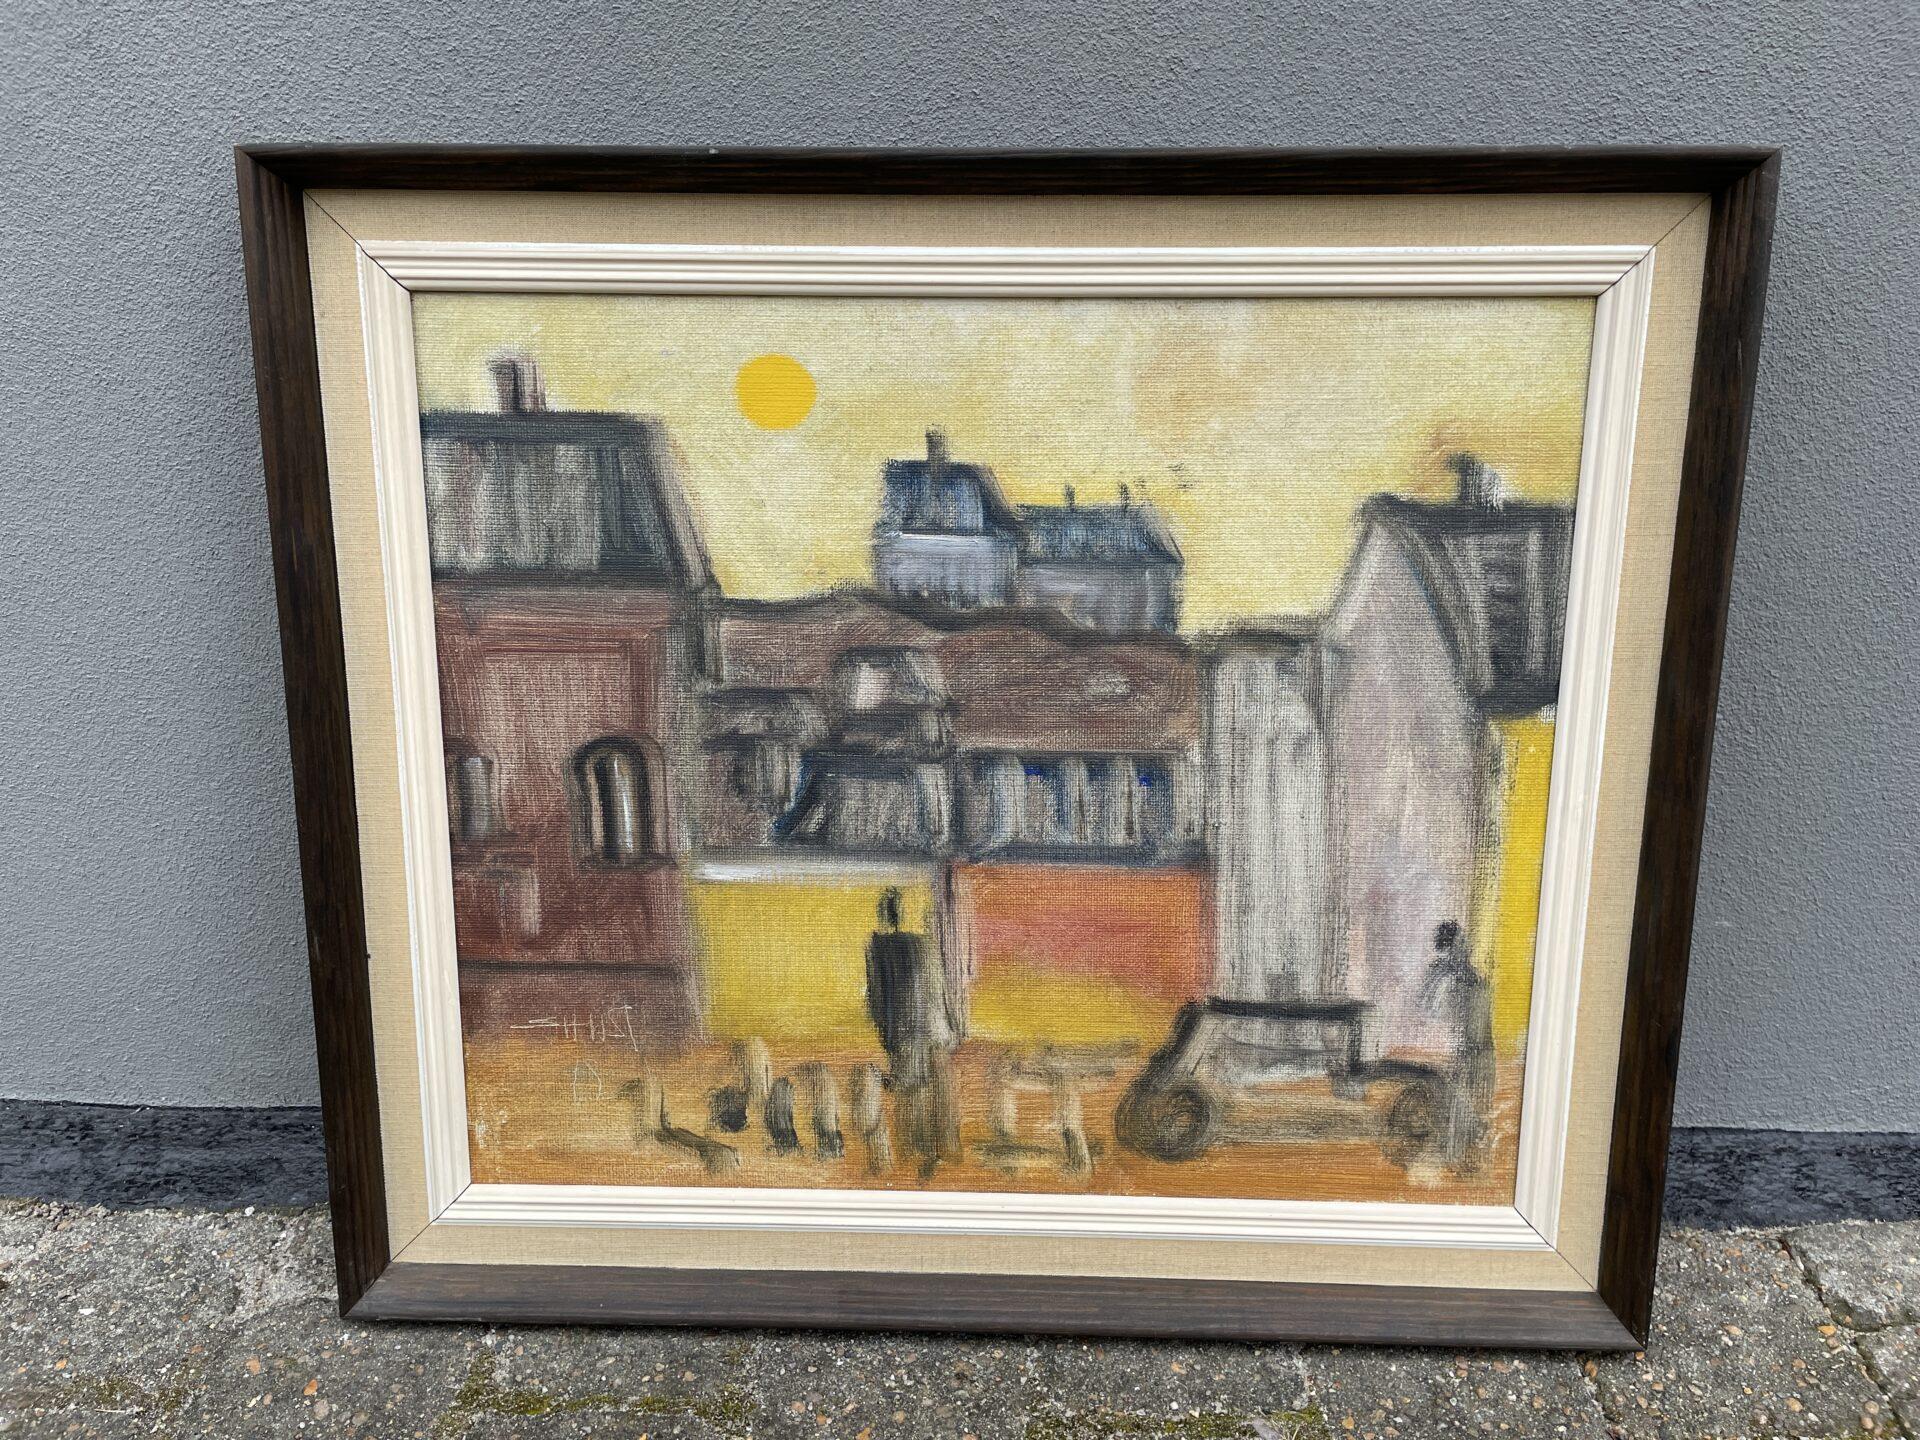 Svend Åge Taucher, rammemål 57x67 cm, pris 700kr